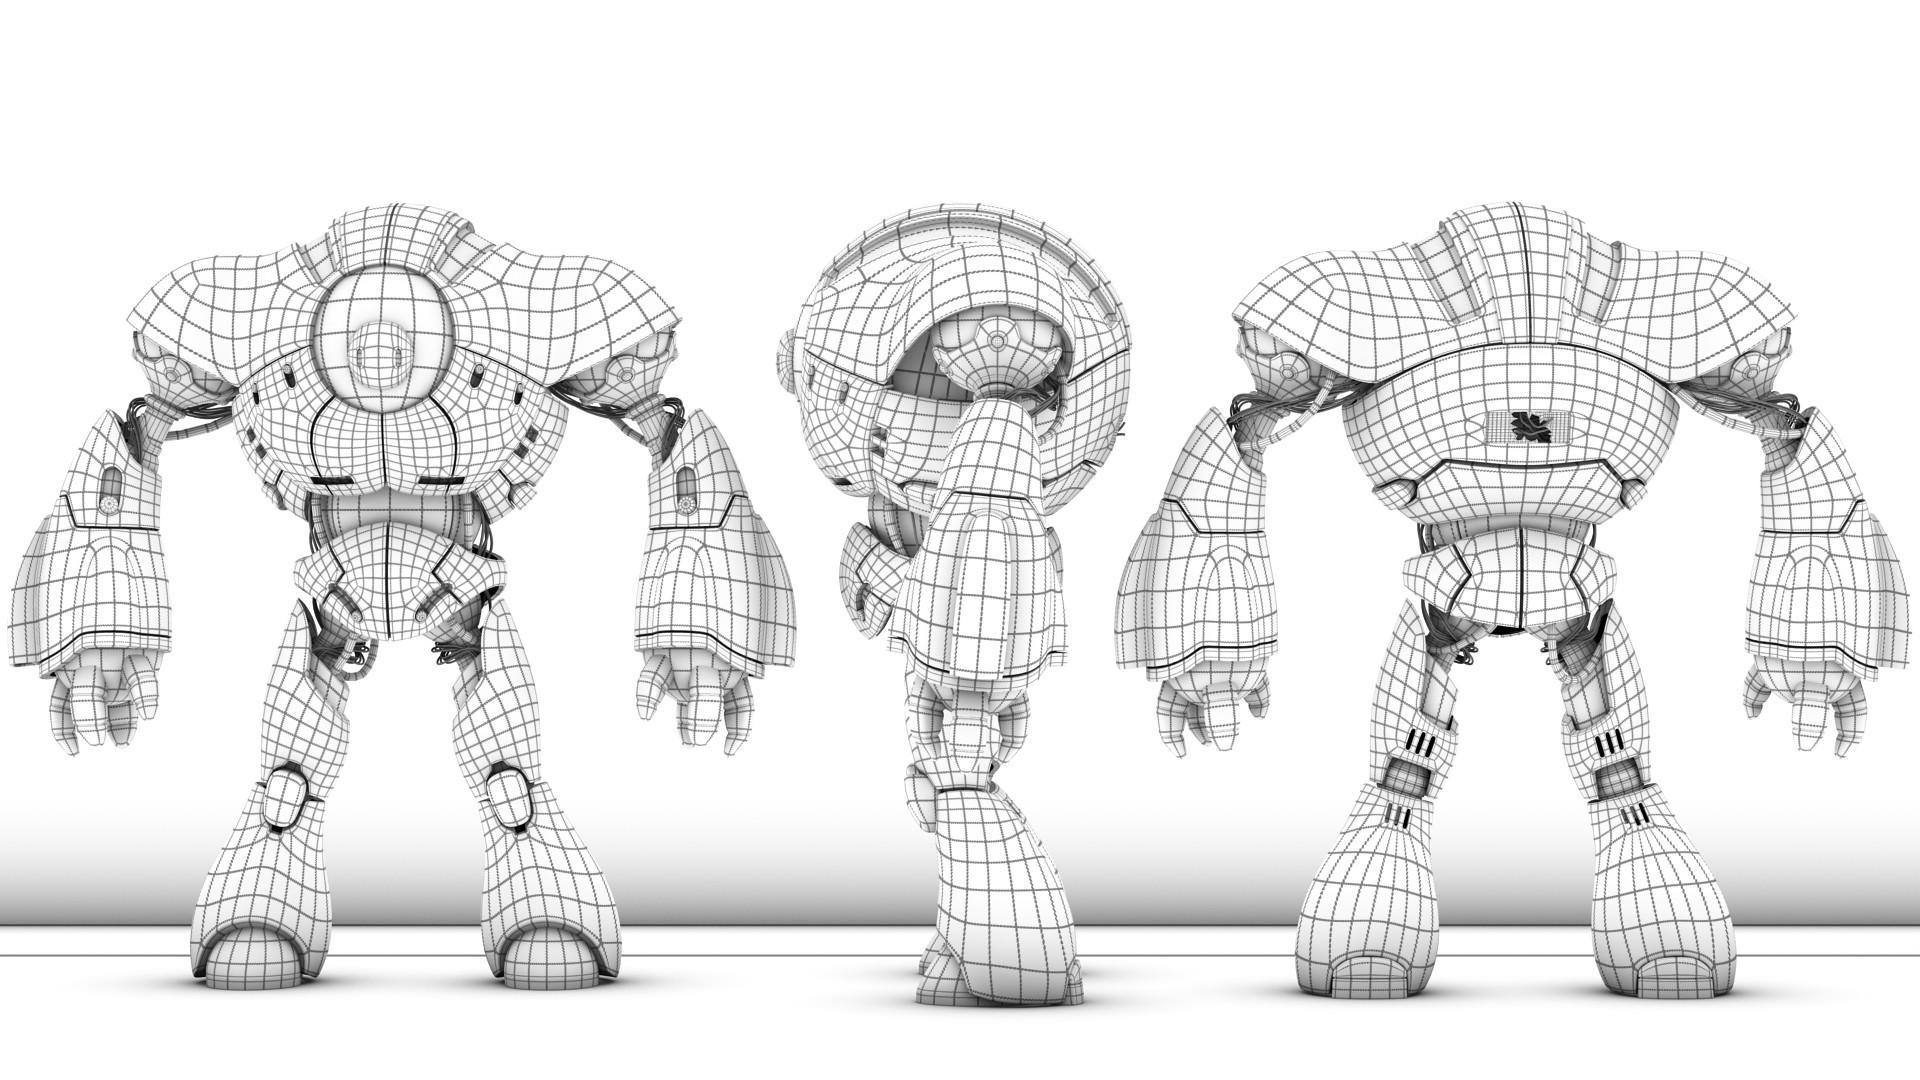 Victor hugo sousa robot texture comp 08 wire